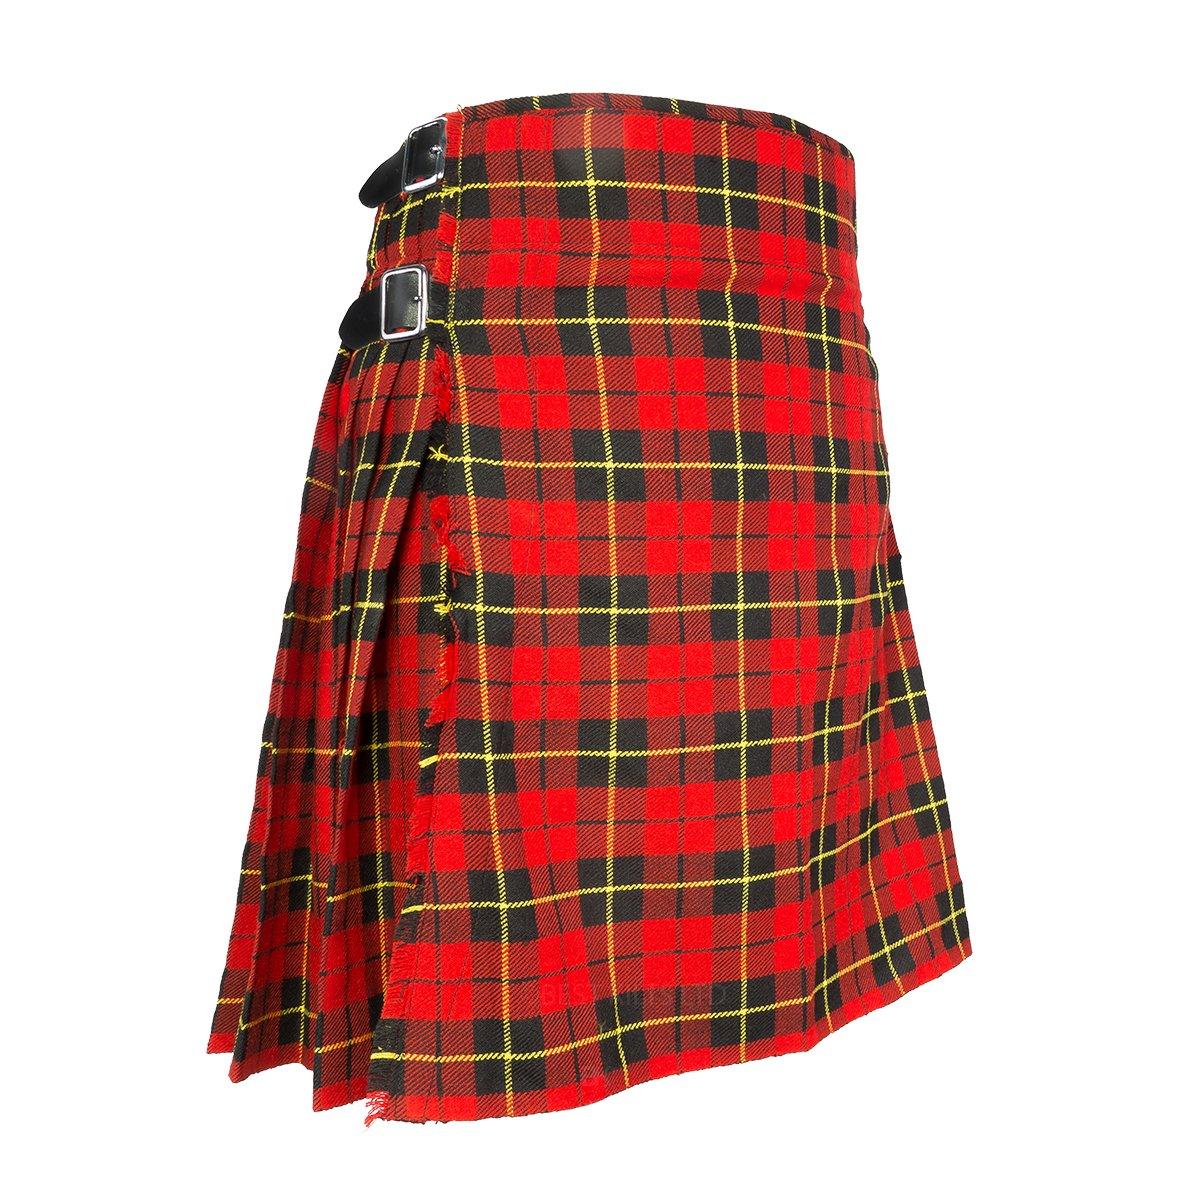 "Best Kilts Men's Traditional Scottish 5 Yard Wallace Tartan Kilt 30""-32"""